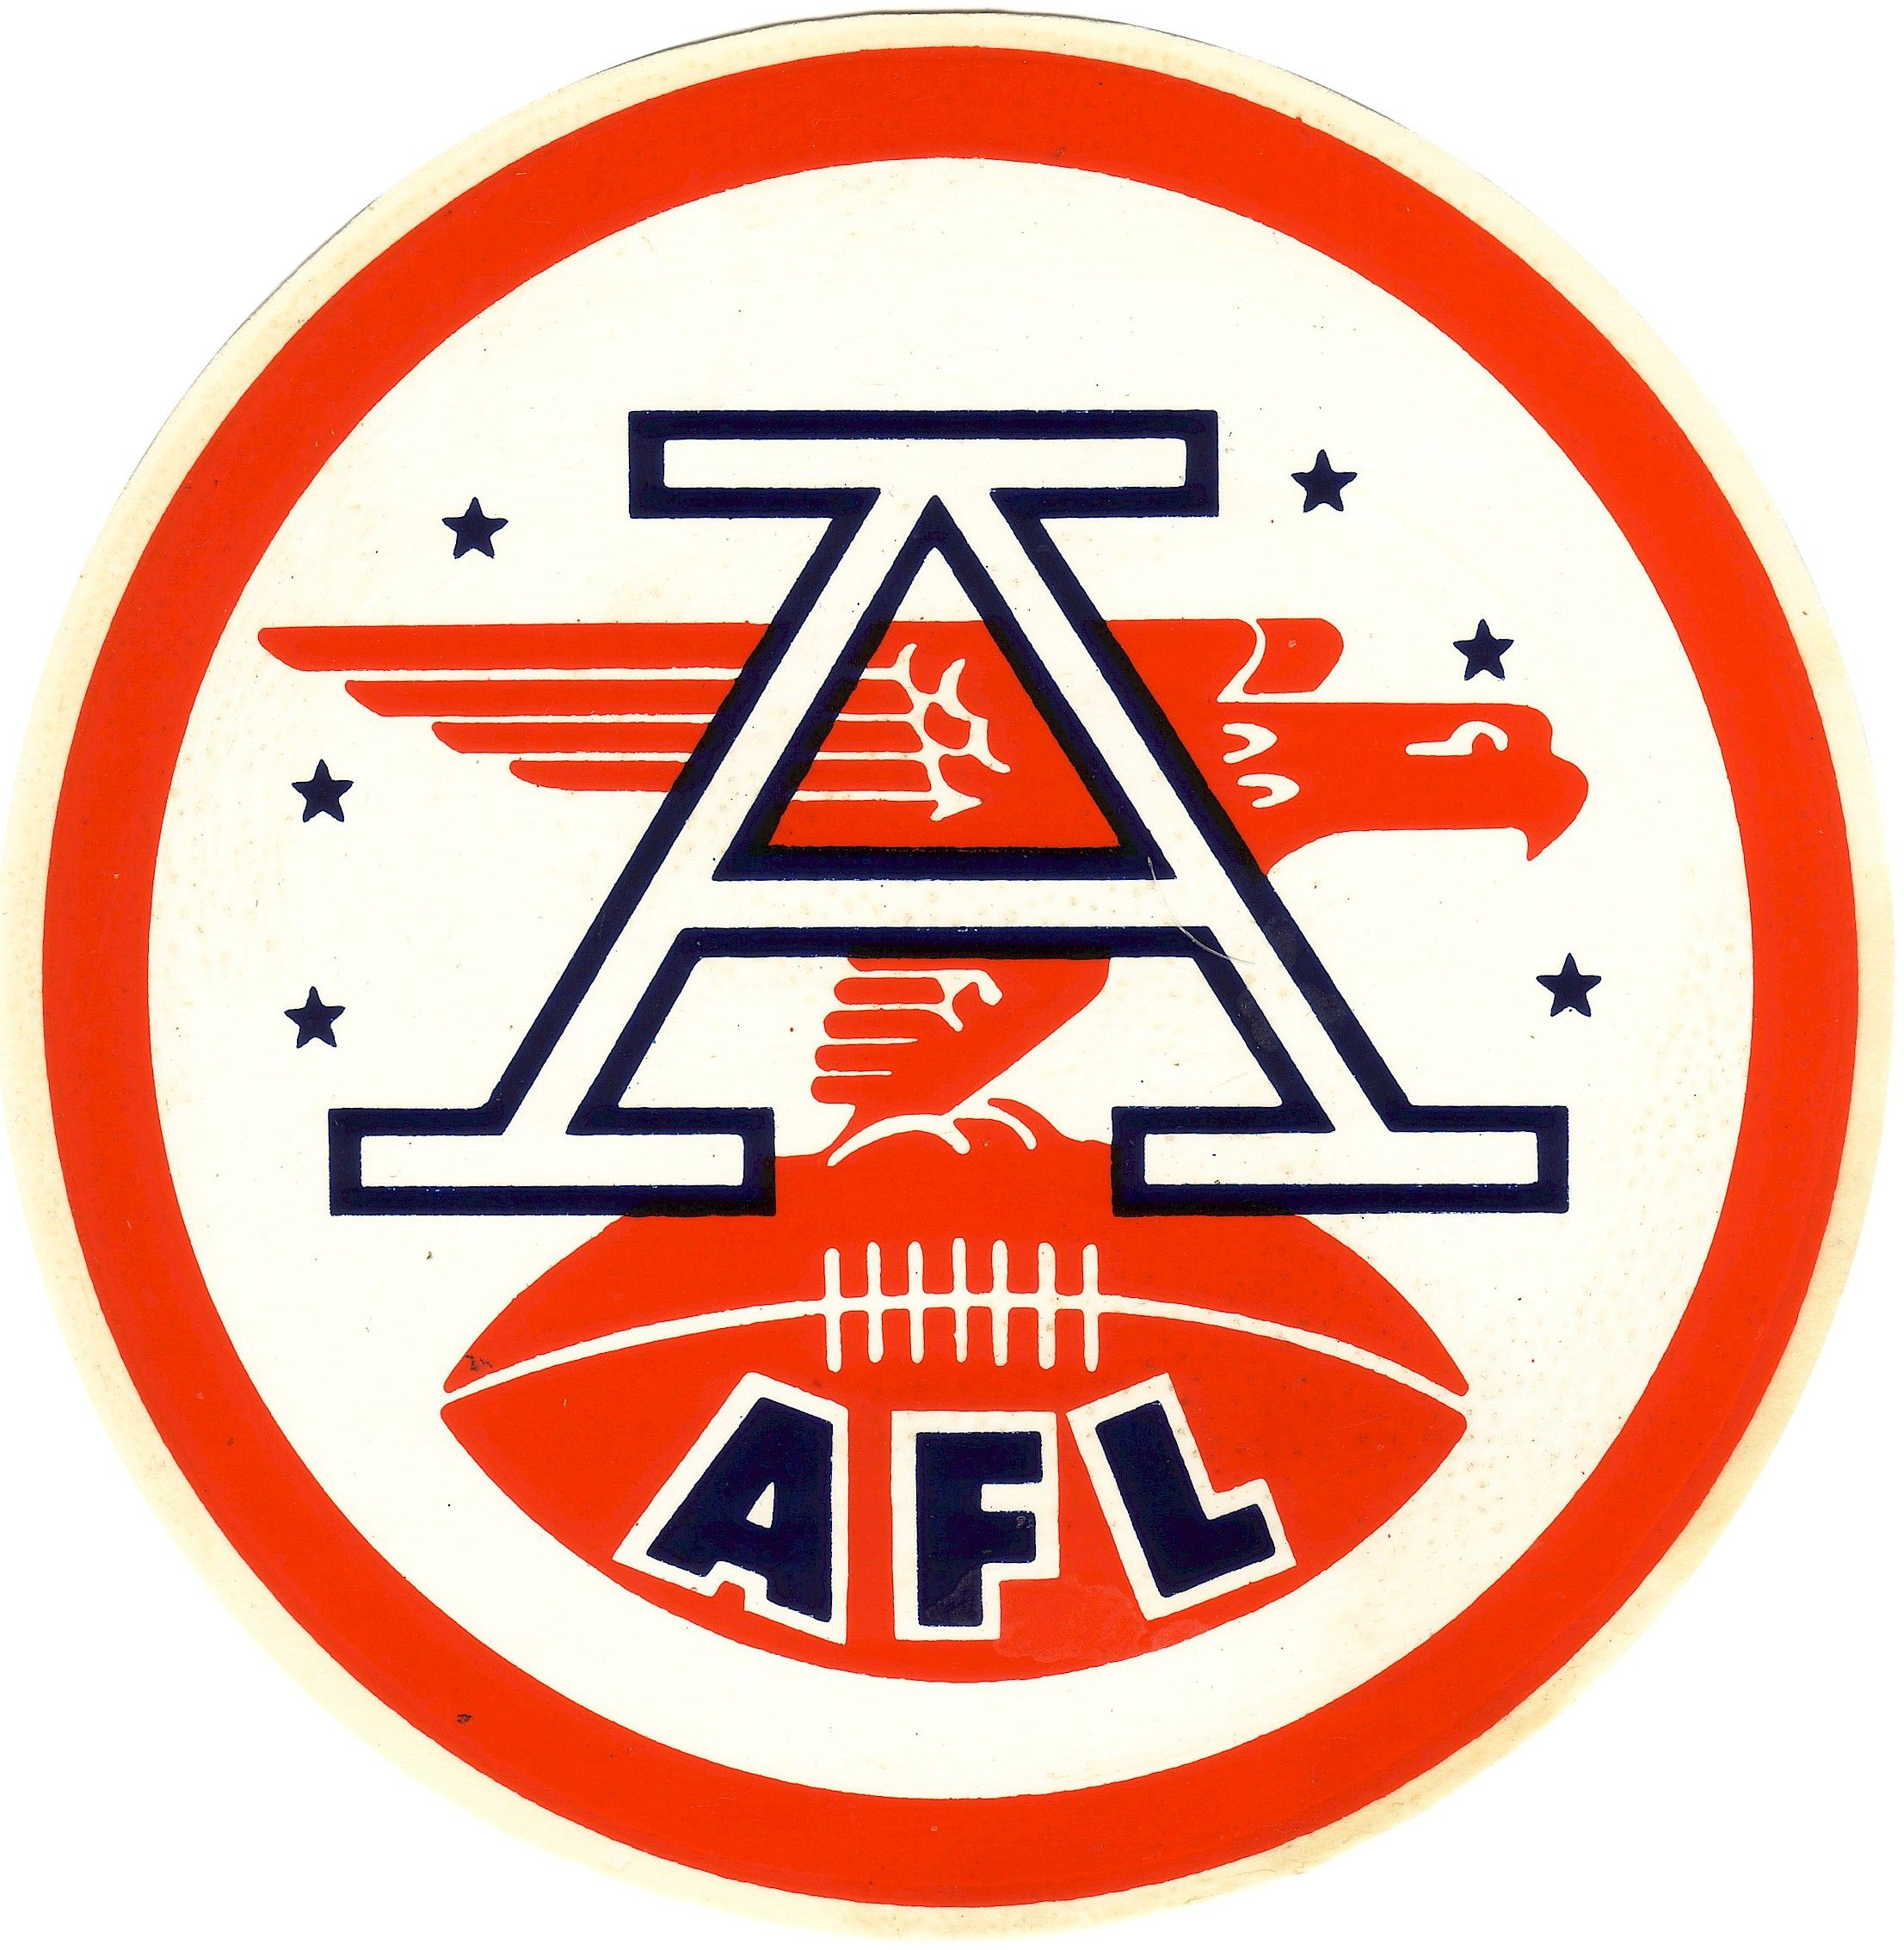 afl nfl football Google Search American football